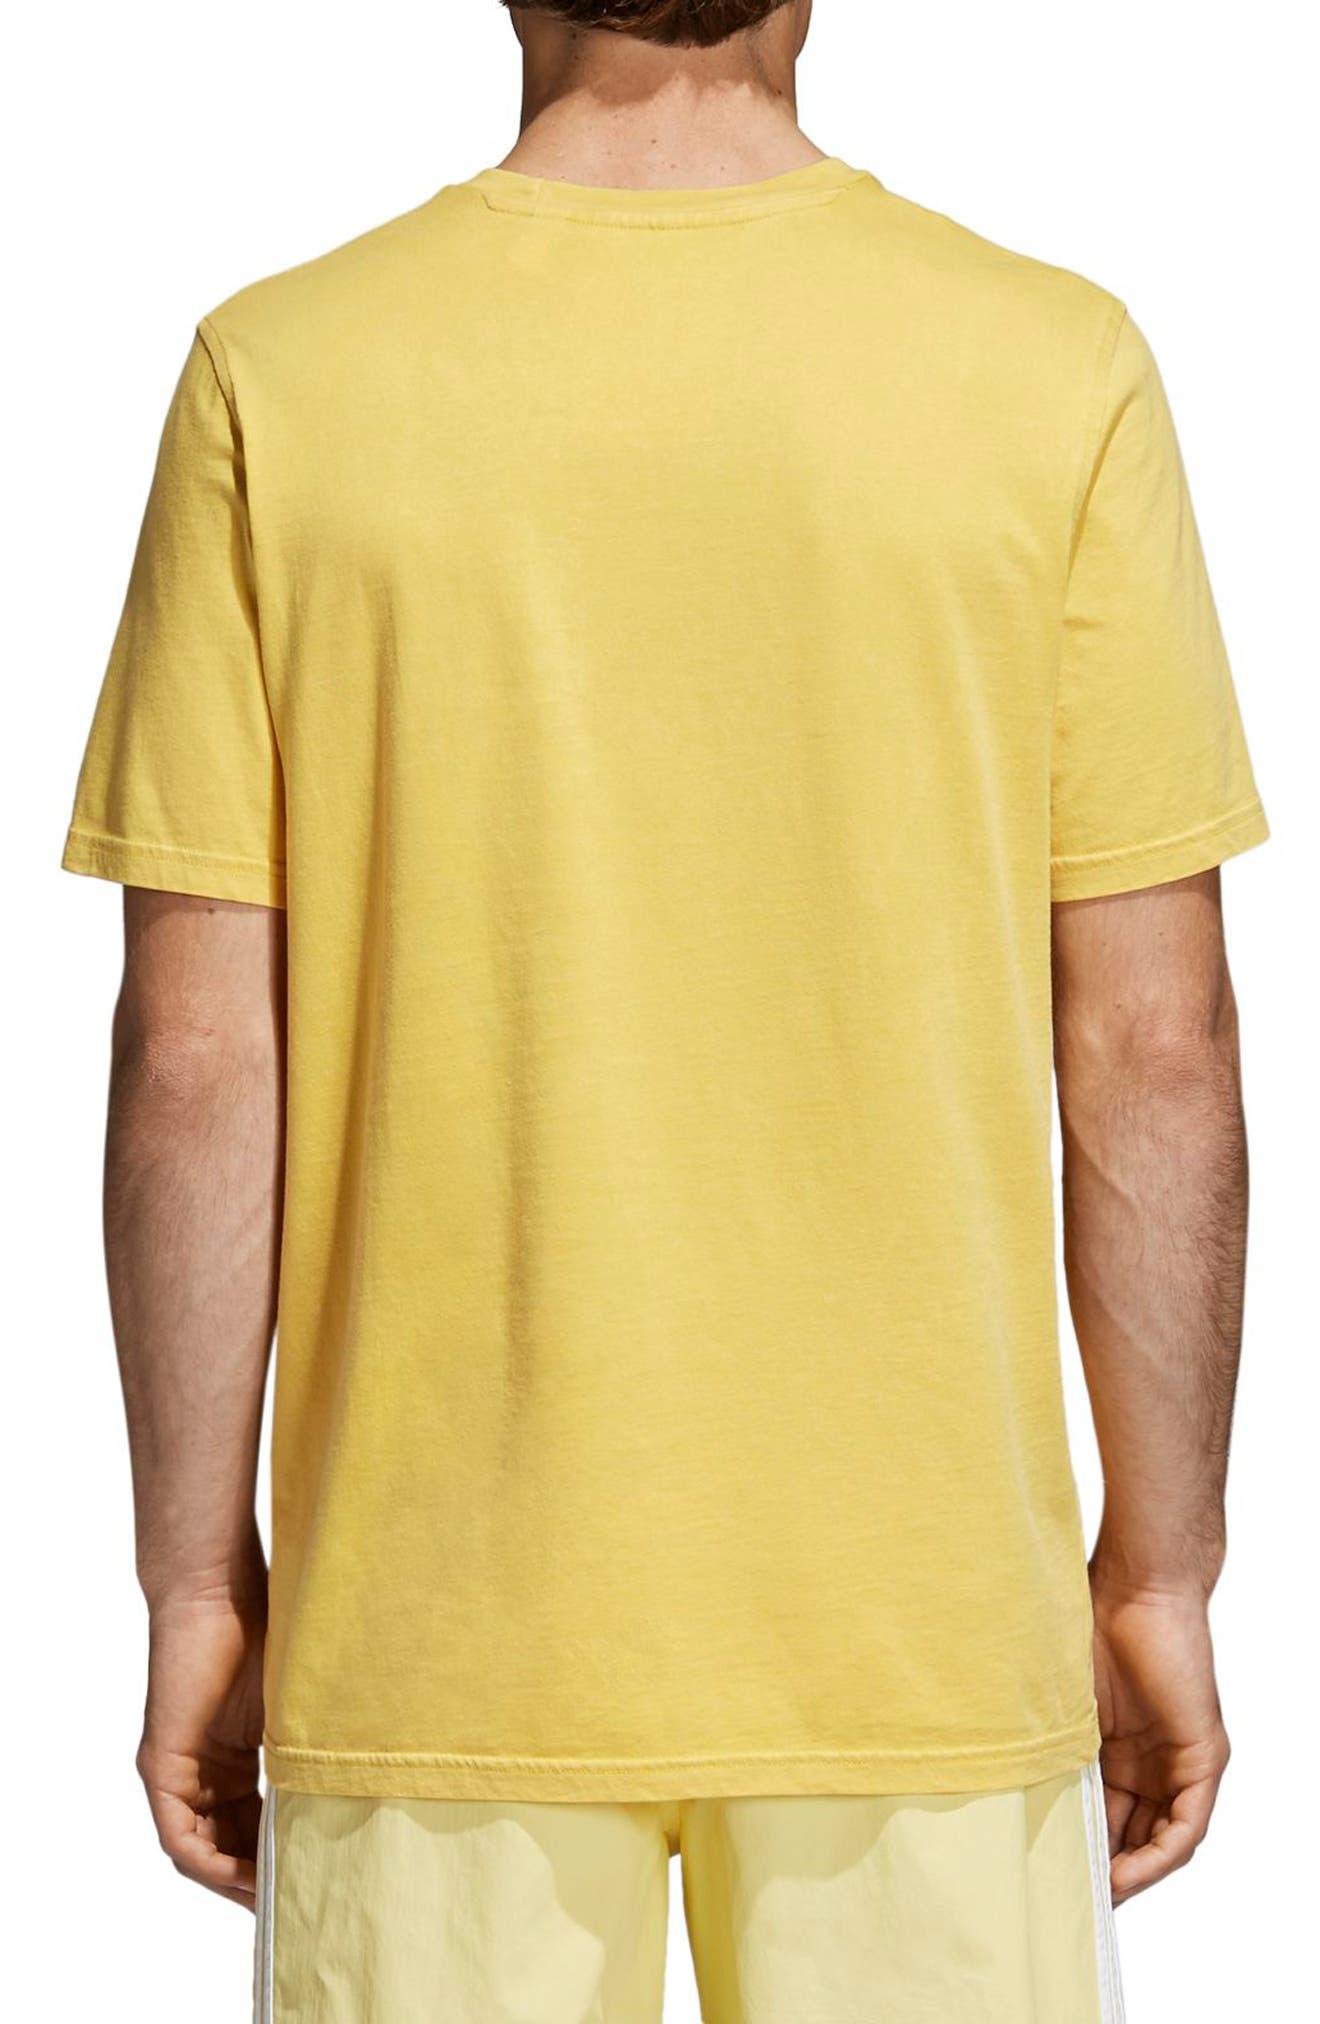 Trefoil T-Shirt,                             Alternate thumbnail 2, color,                             730